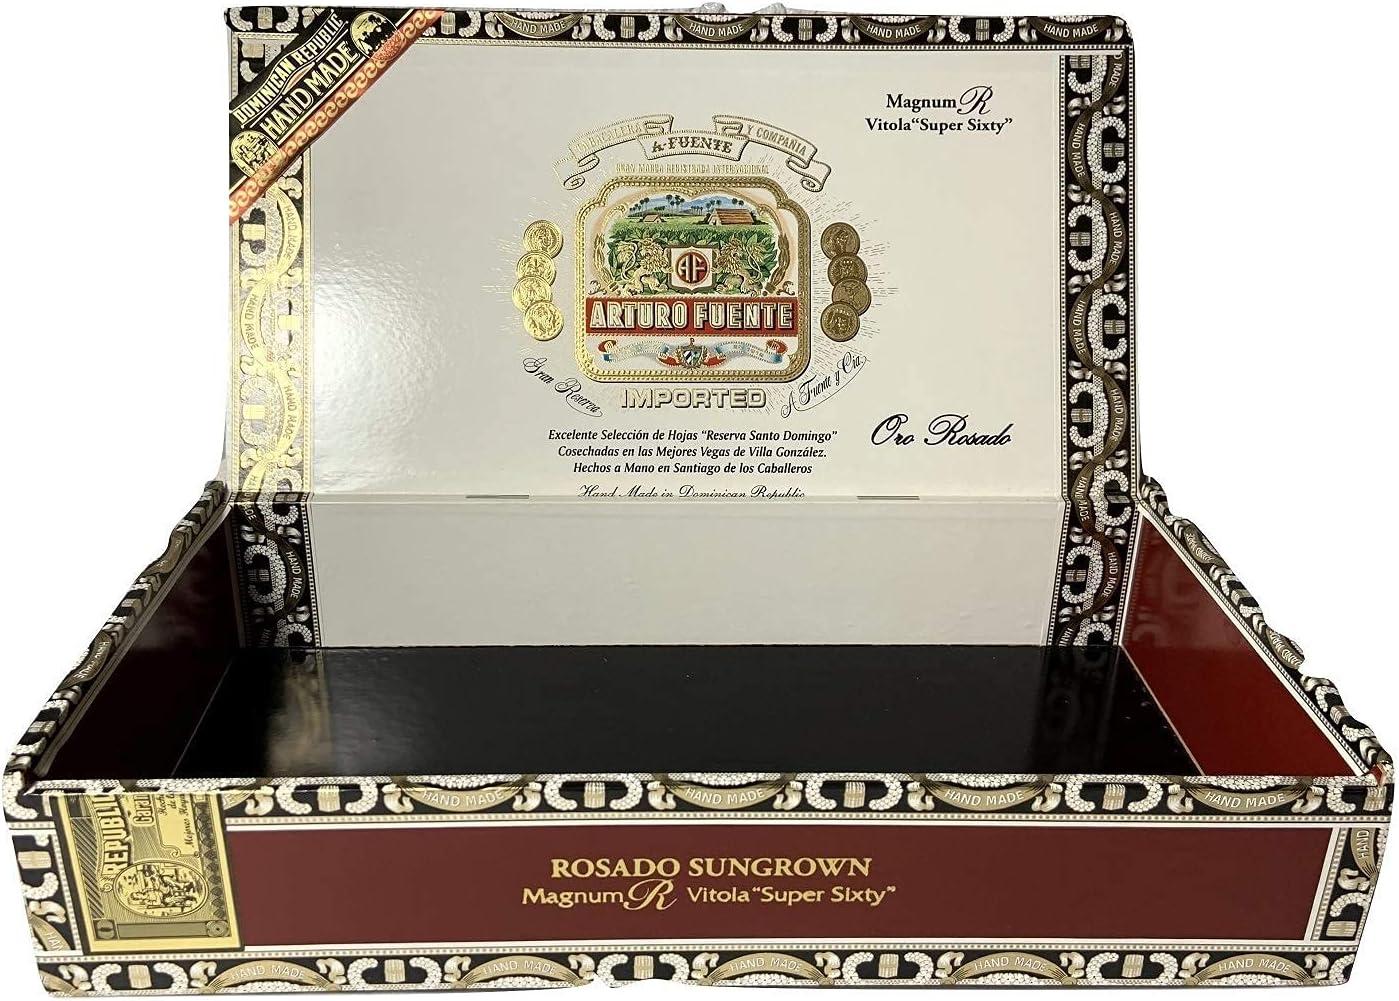 XBR Elegante Estuche de Caja de Puros de Madera Premium para humidor de Puros para Manualidades, Guitarras o Almacenamiento (Magnum R Vitola) para Almacenamiento de Puros (Tamaño: Magnum R Vitola)